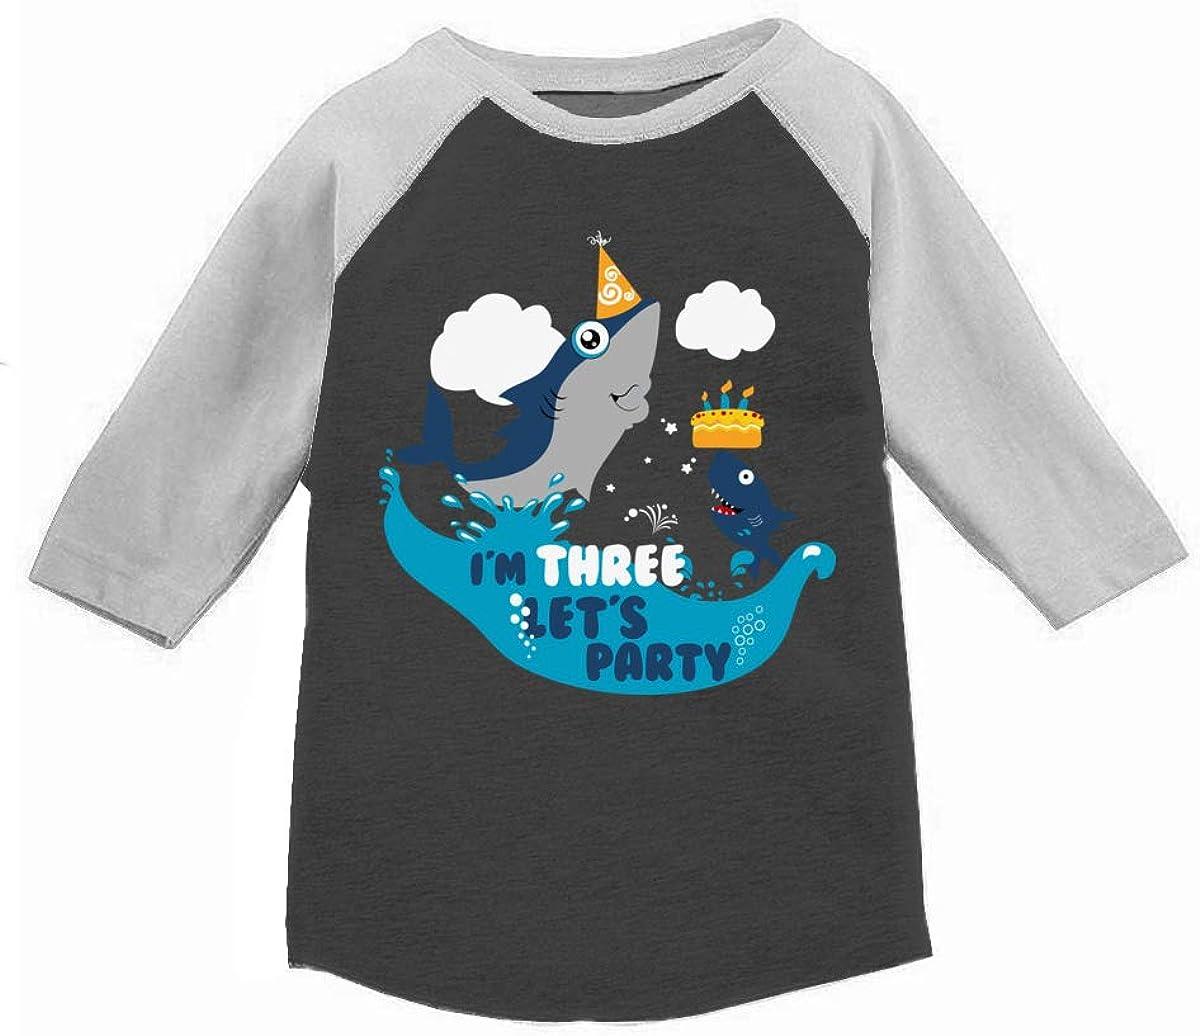 Awkward Styles Shark Toddler Reglan Shirt Shark Birthday Tshirt Gift for 3 Year Old